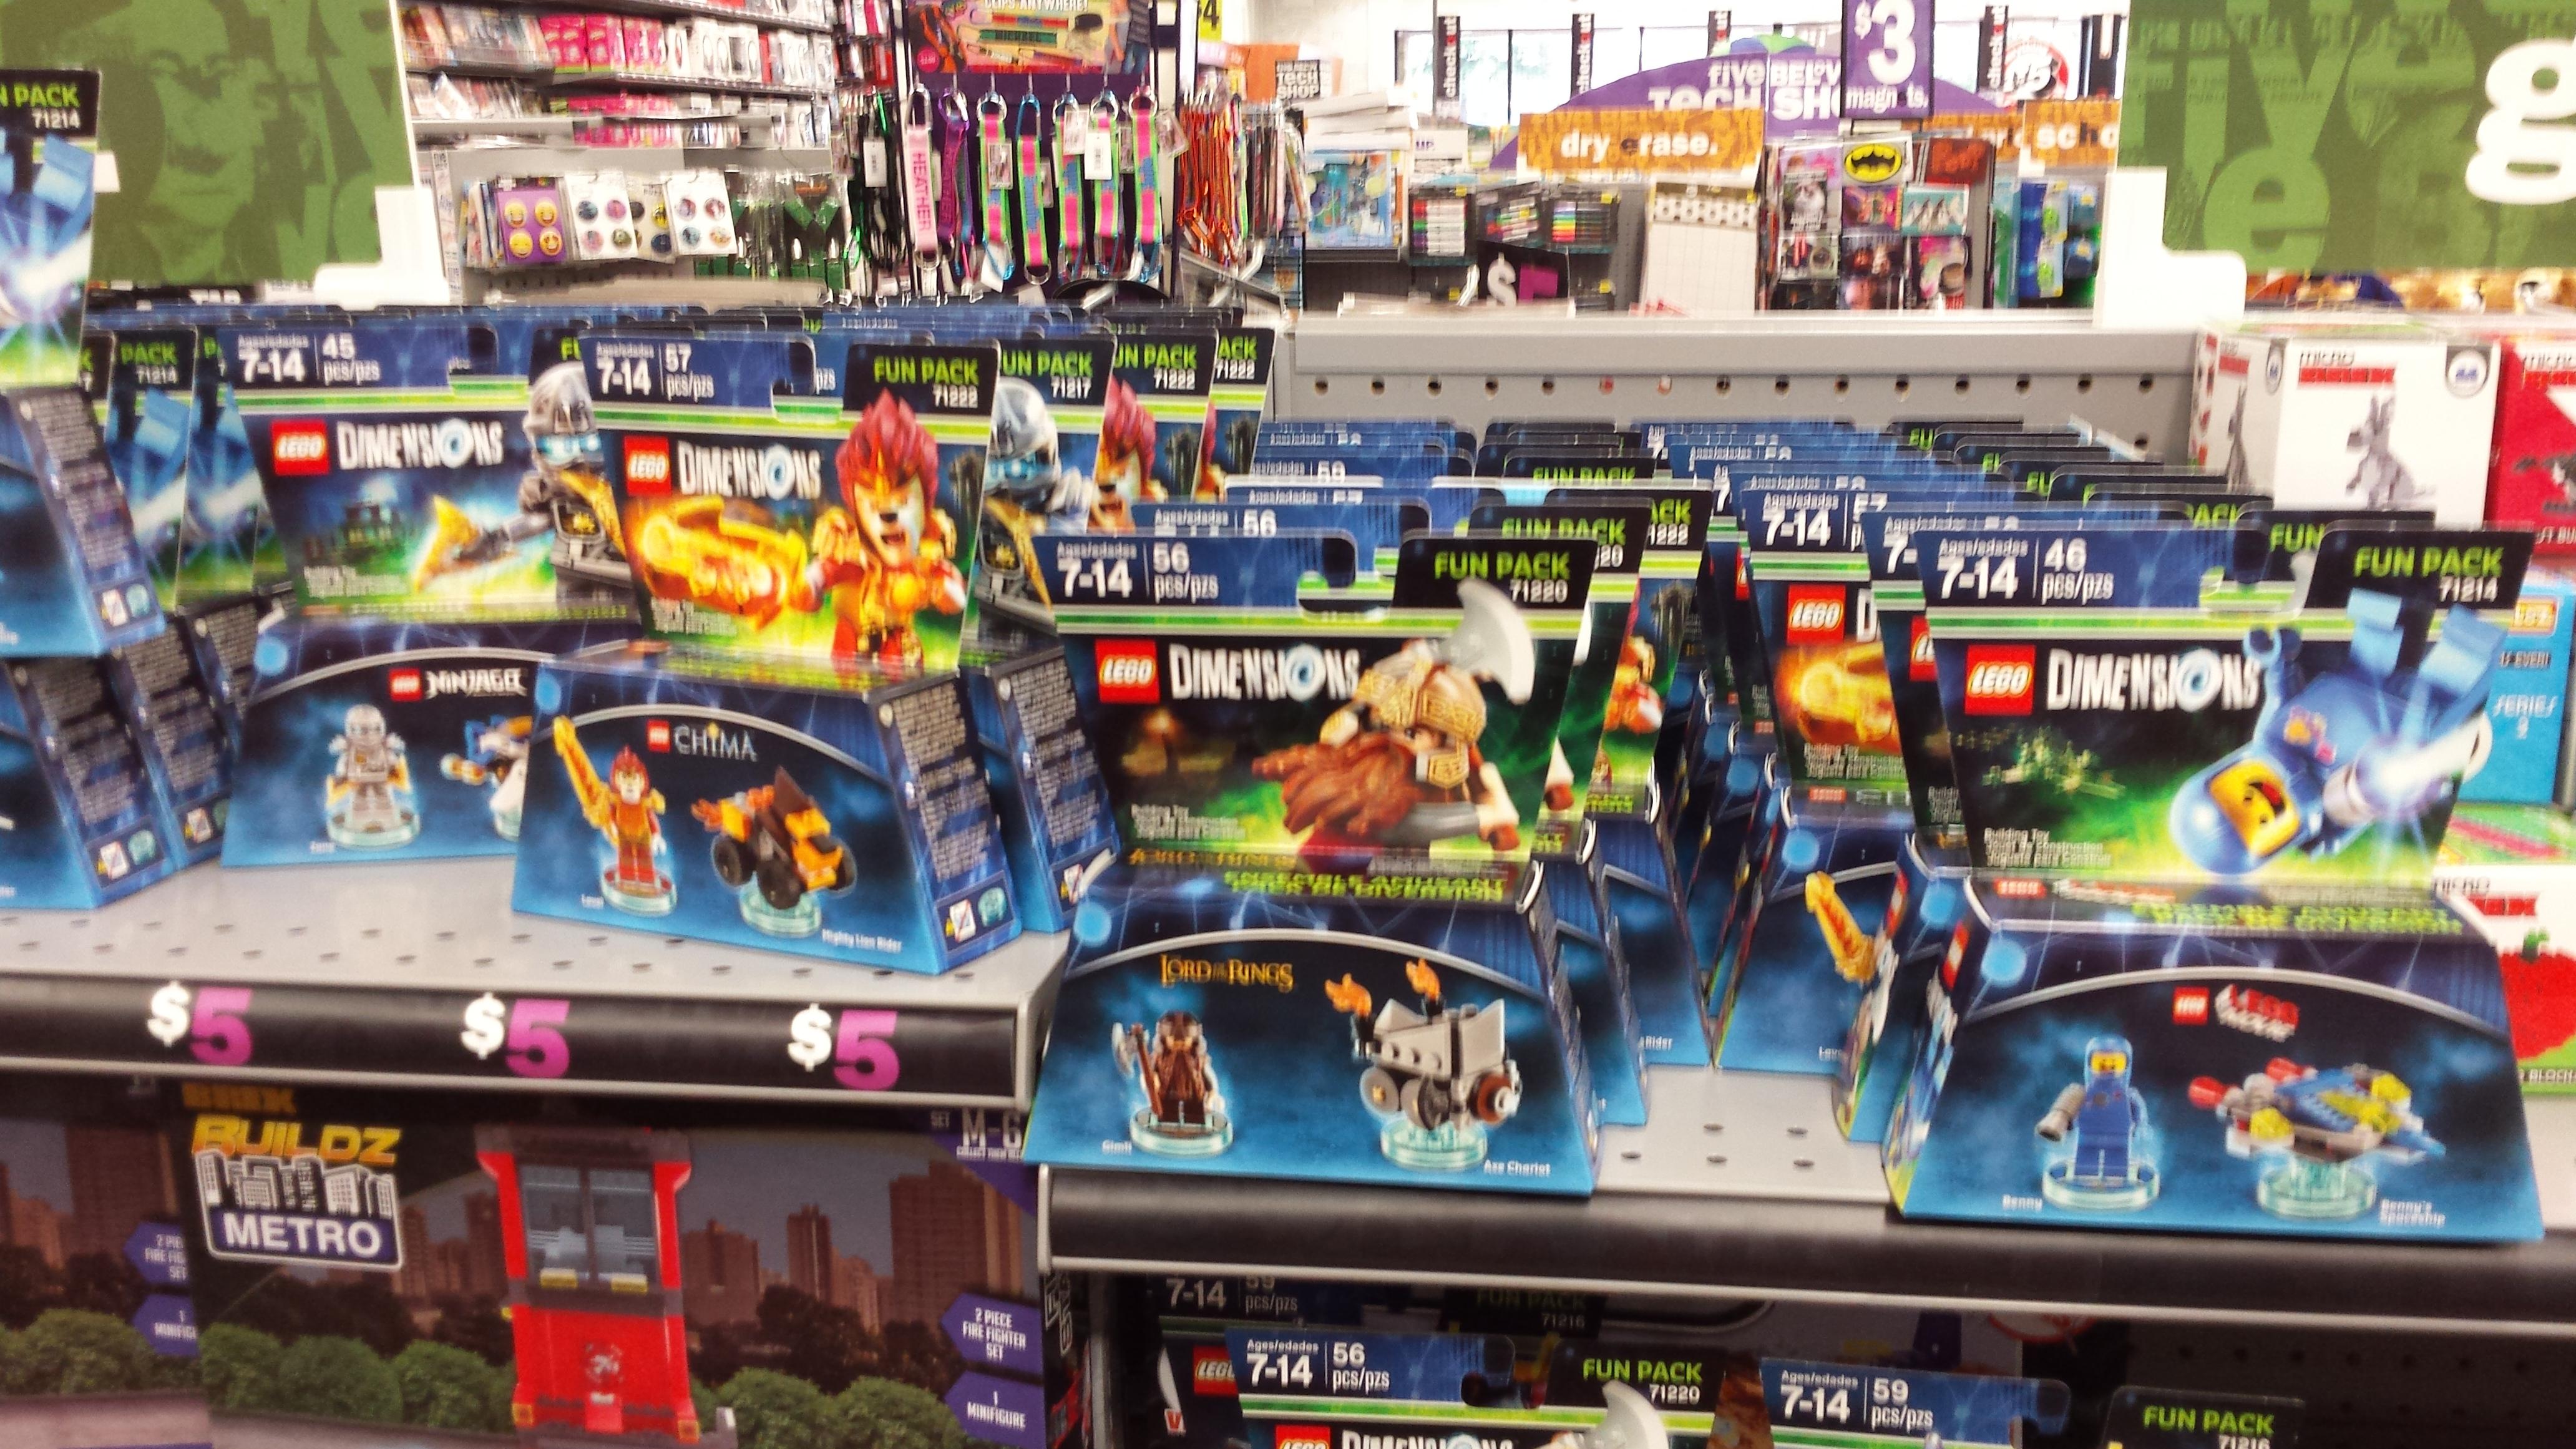 Lego Dimensions Fun packs $5 @ Five Below B&M, YMMV